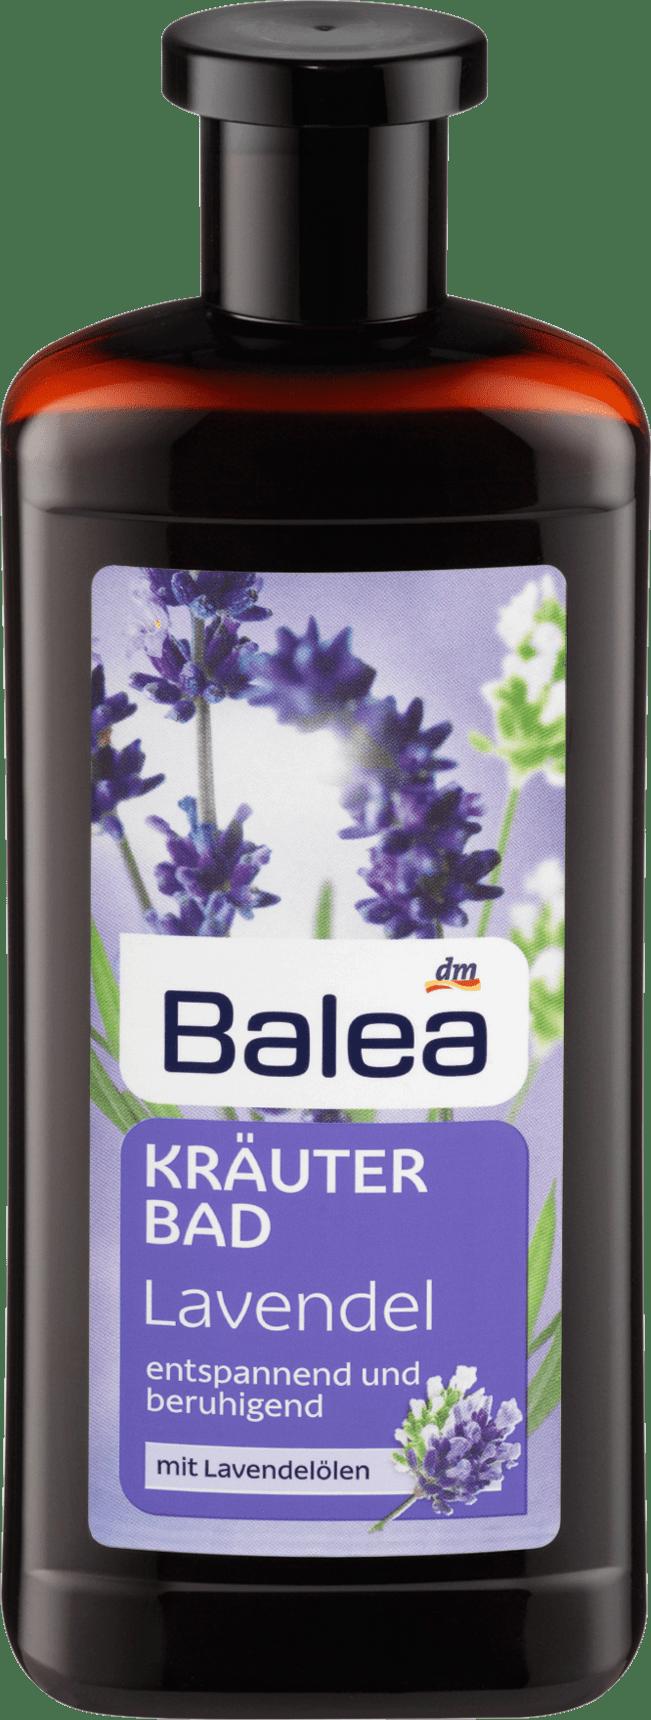 Balea Bain aux herbes lavande, 500 ml